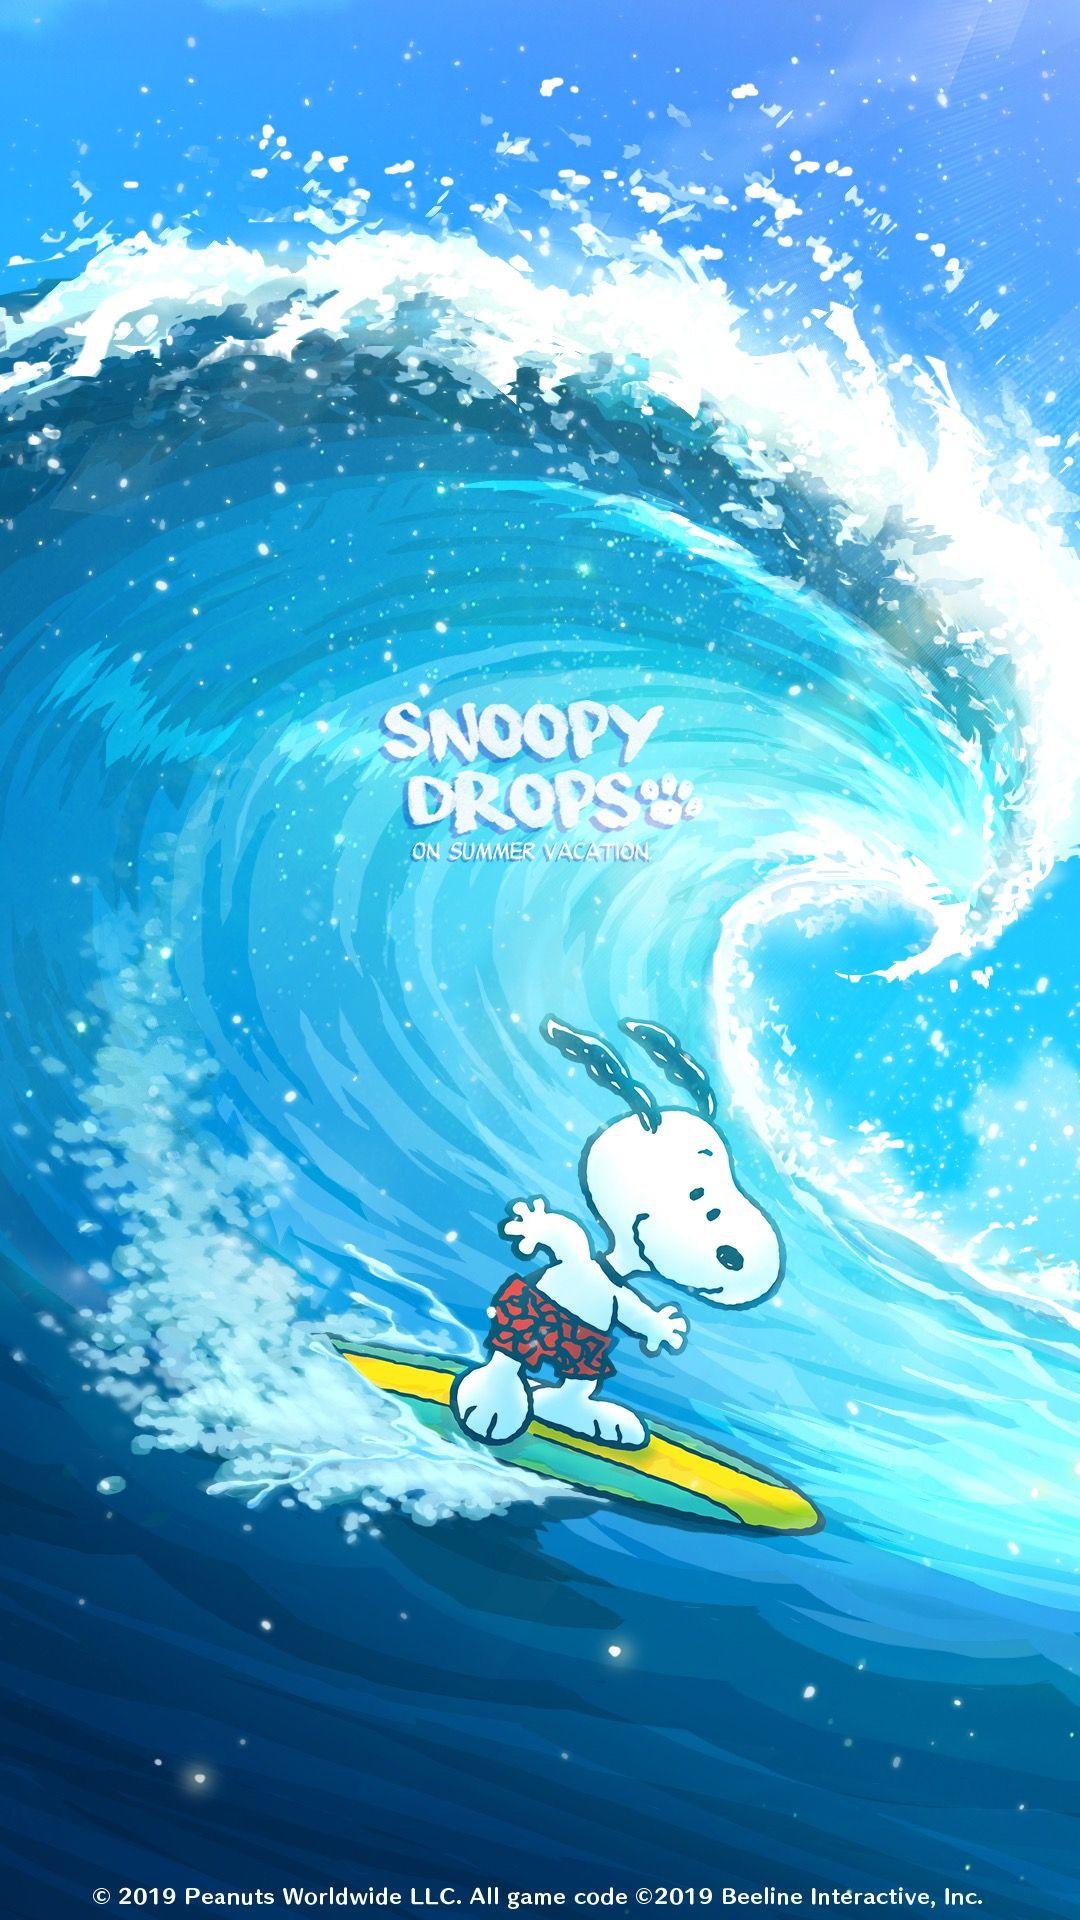 Snoopy スヌーピー Surf スヌーピーの壁紙 スヌーピー